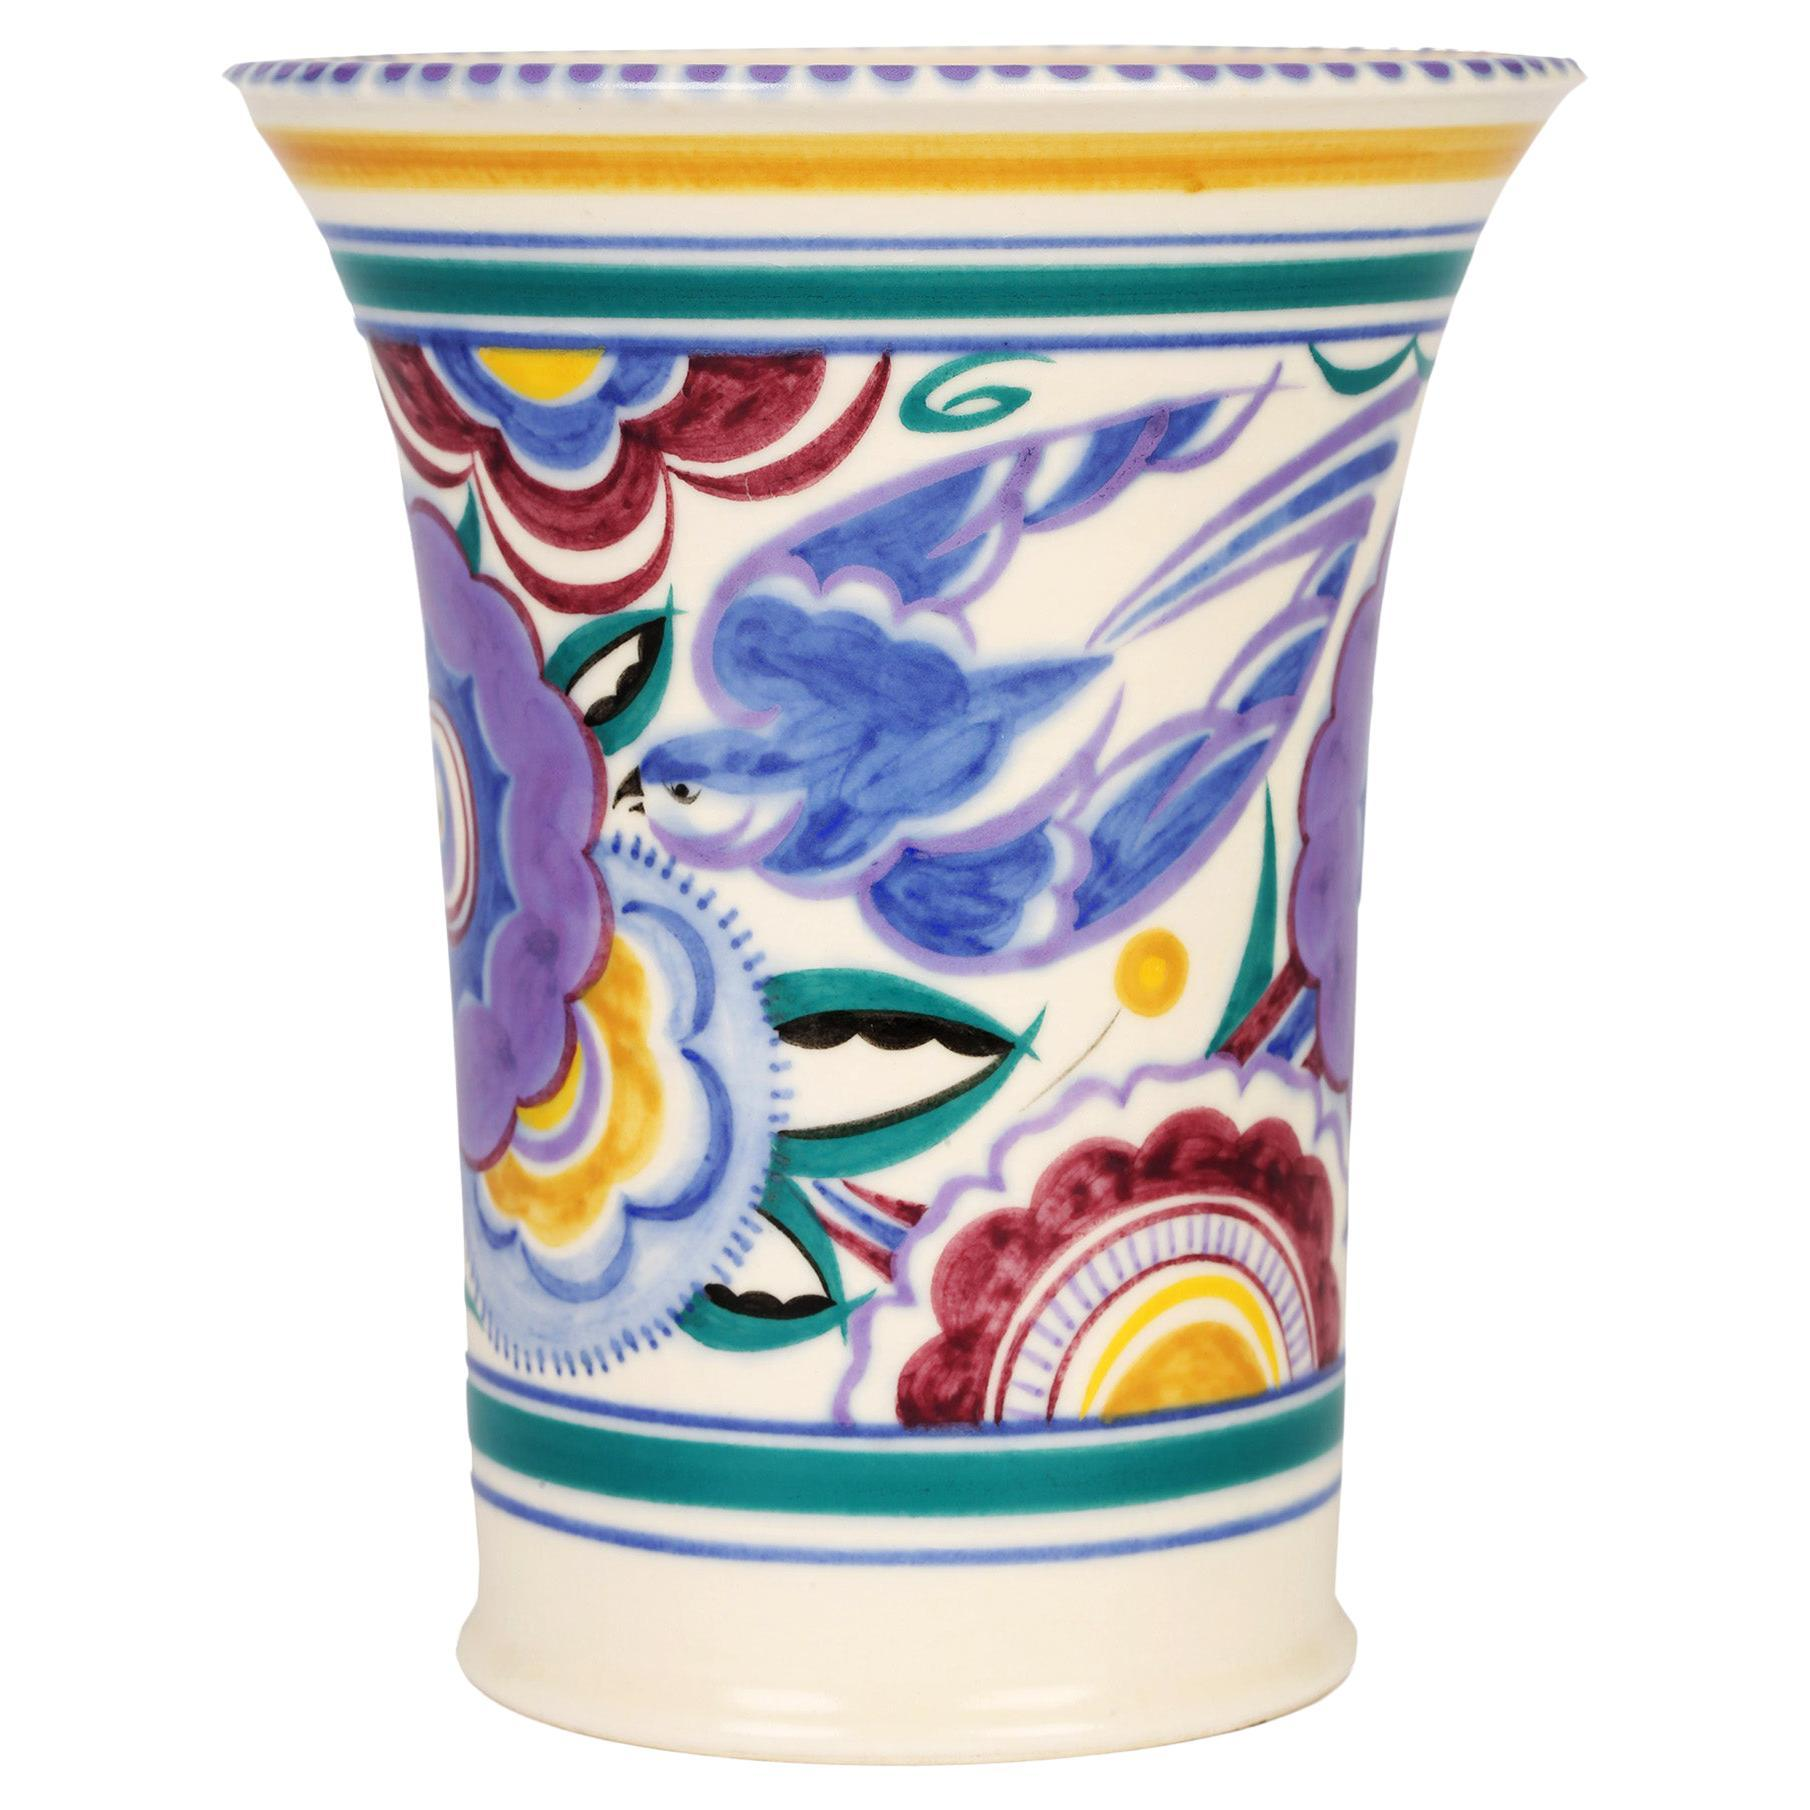 Truda Carter Poole Pottery Art Deco Bluebird Art Pottery Vase